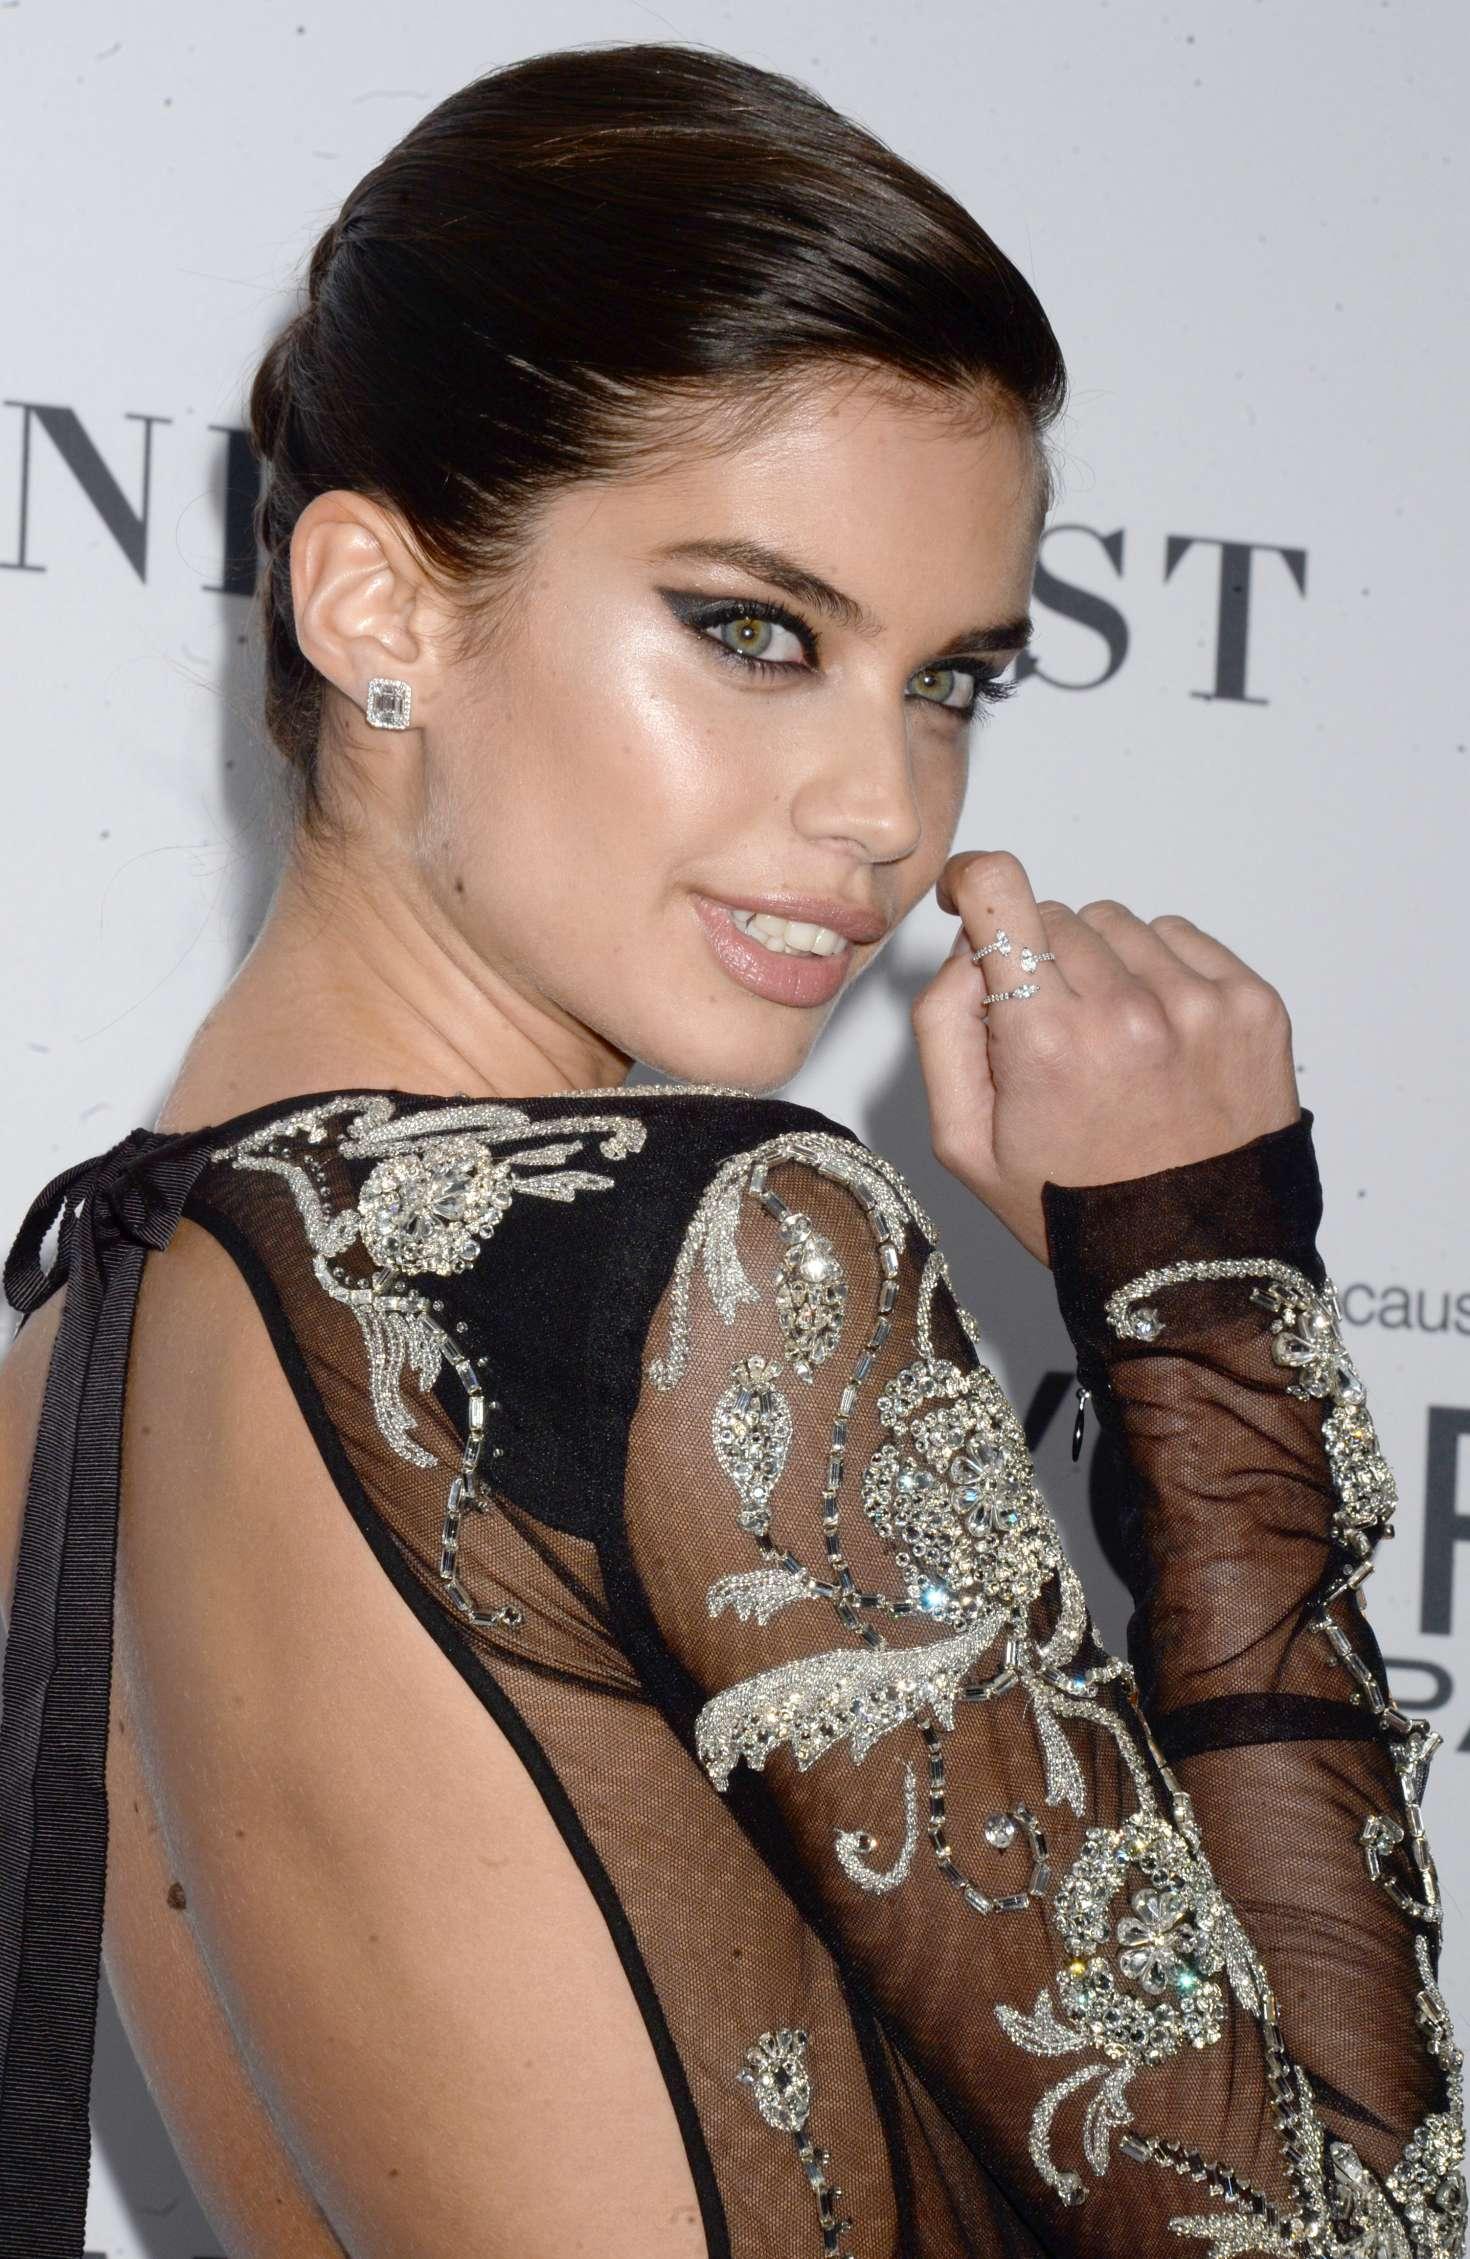 Sara Sampaio 2017 : Sara Sampaio: 2017 Glamour Women of The Year Awards -07